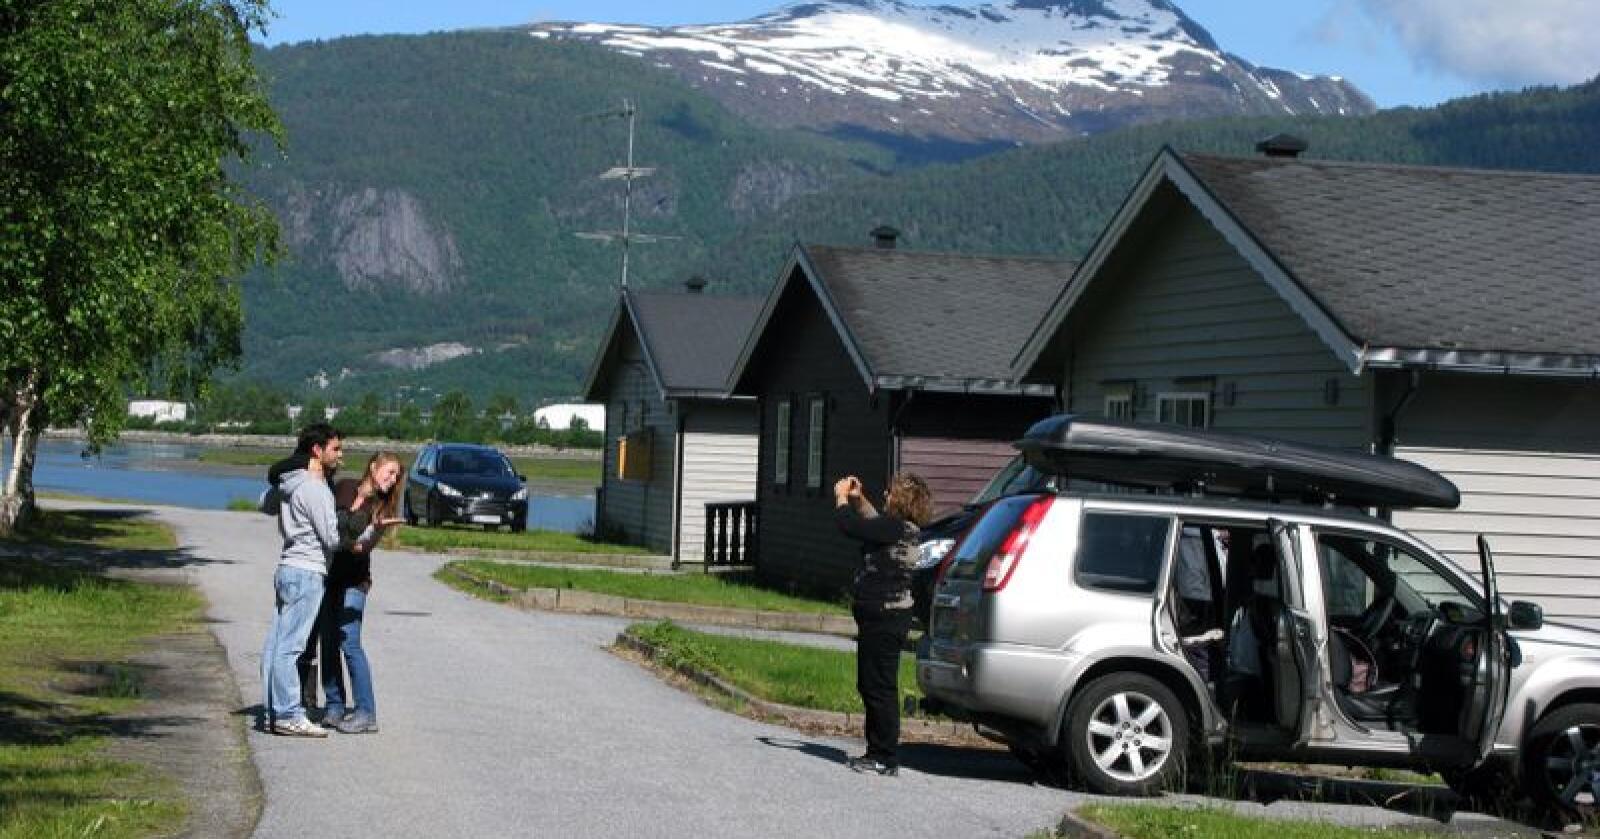 Utenlandske turister i Åndalsnes. Illustrasjonsfoto: Berit Keilen / NTB scanpix